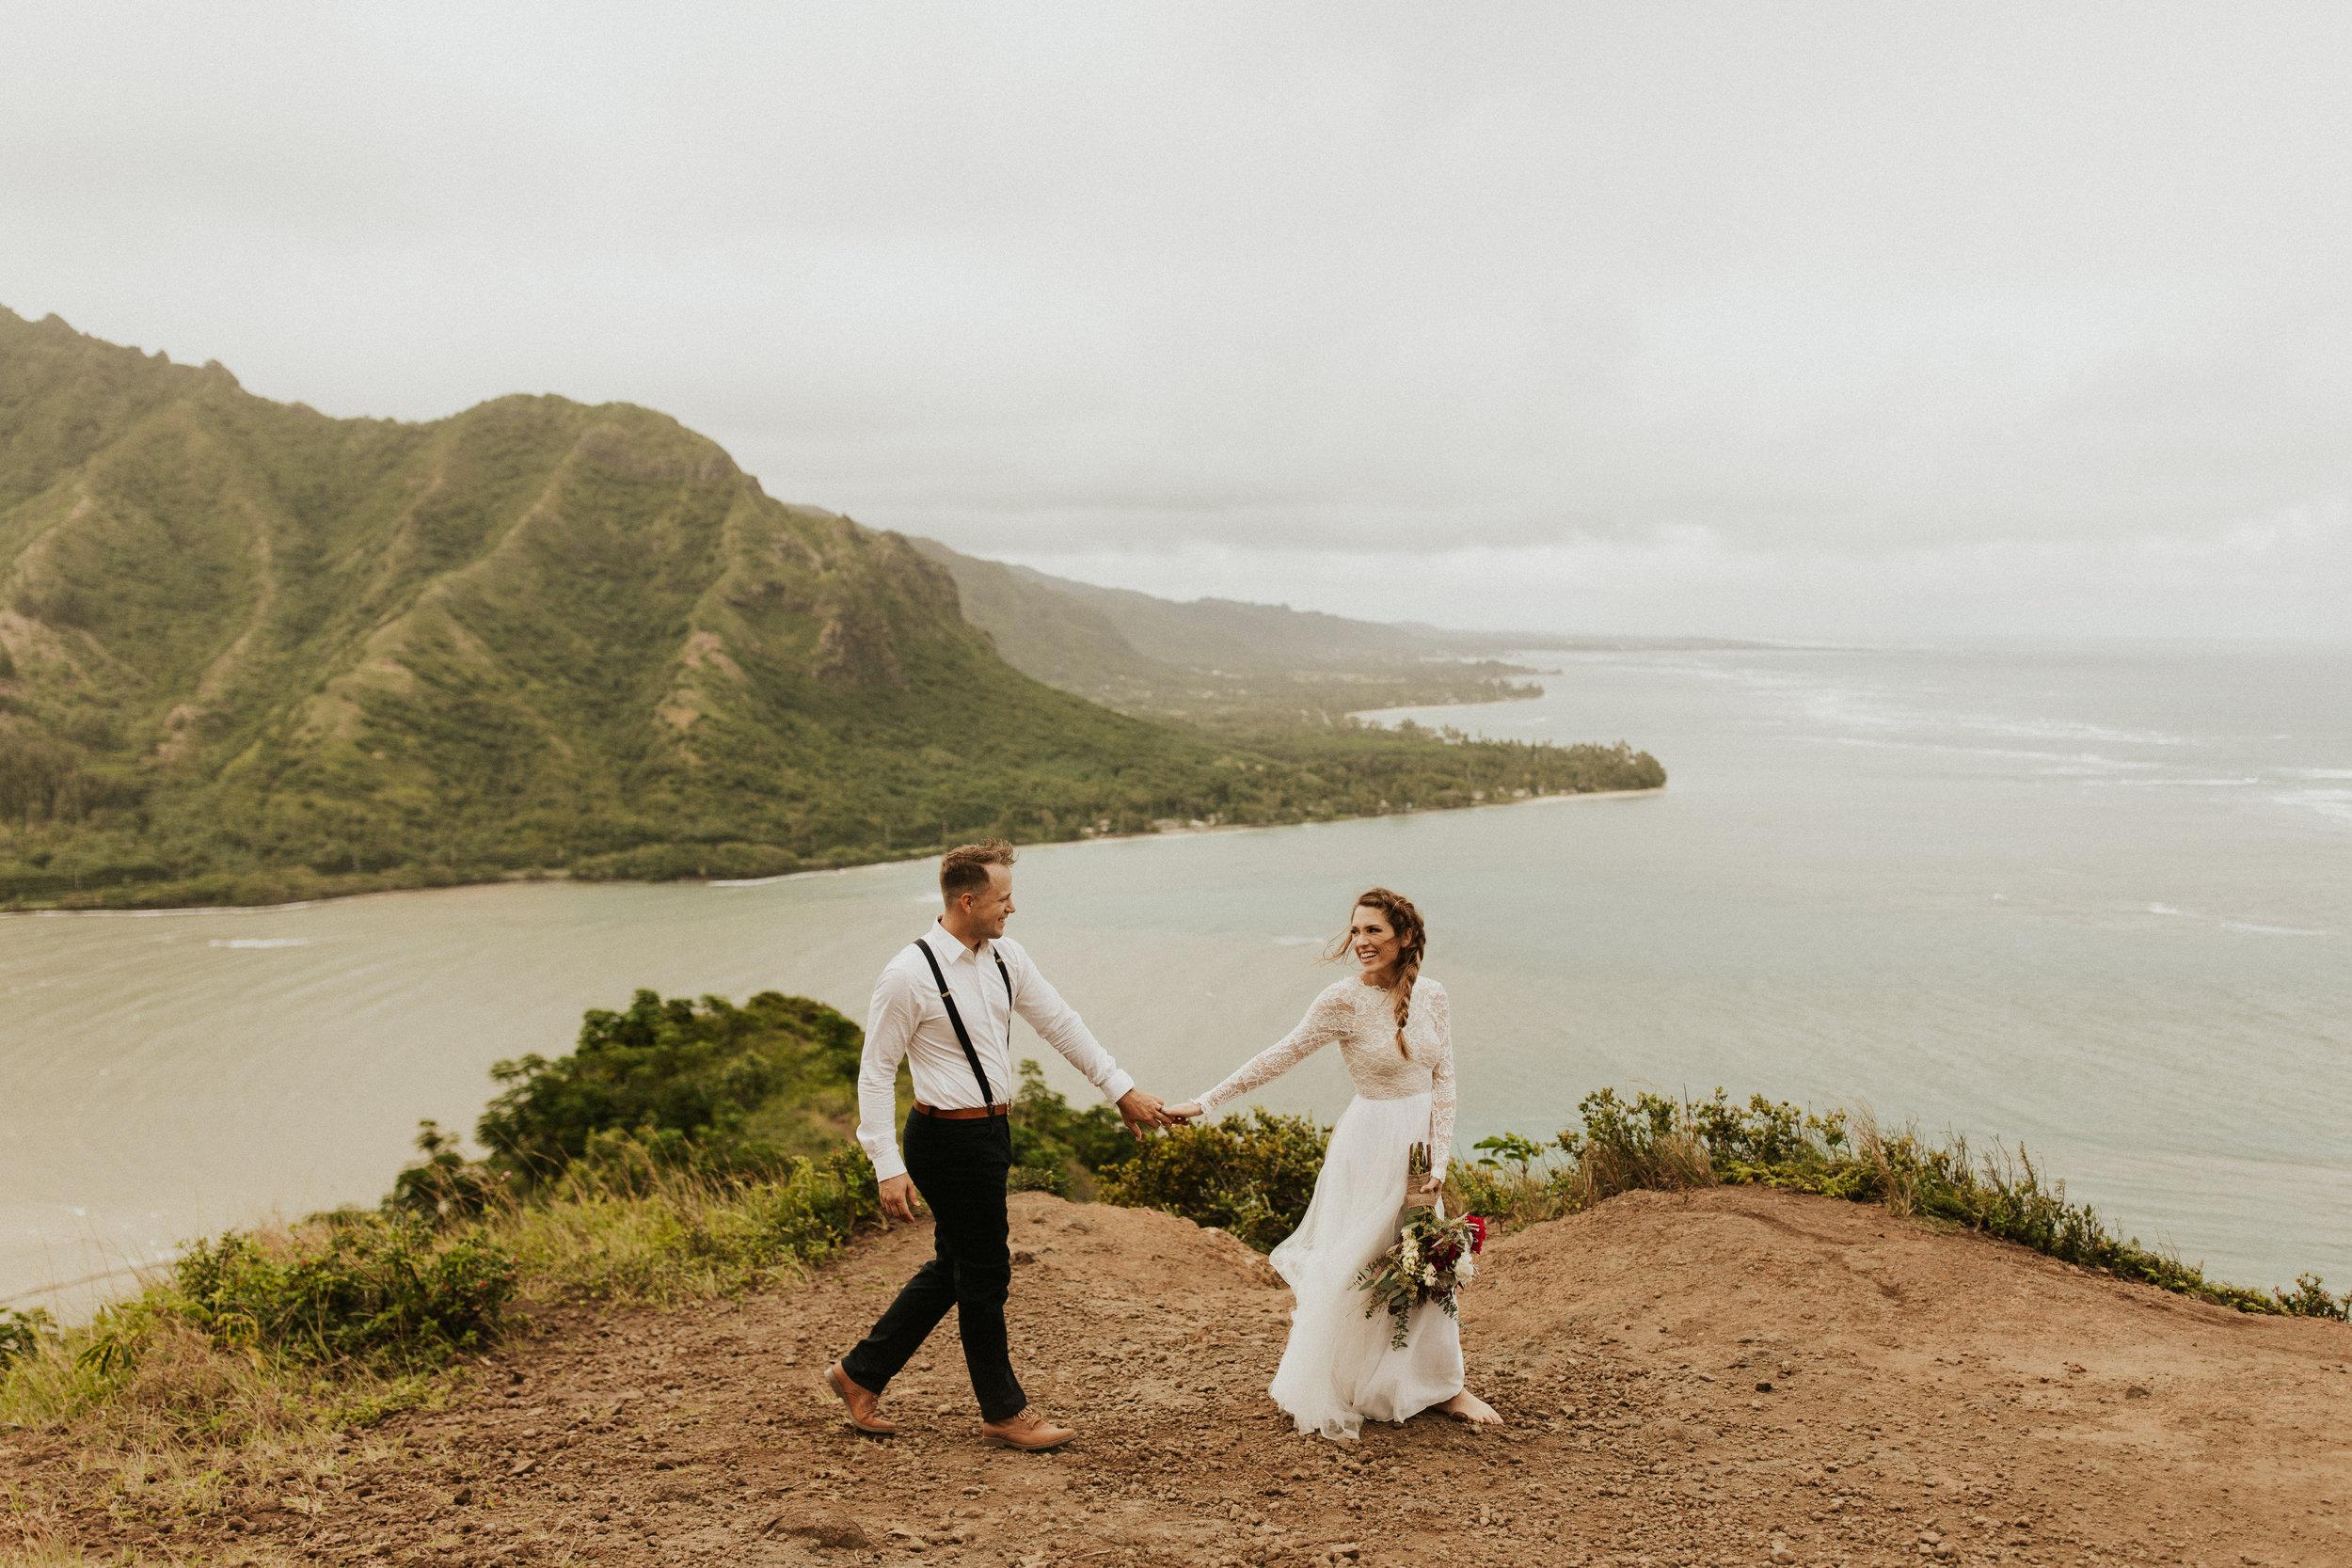 the-mclachlans-destination-elopement-photographers-mountain-hike-sena-eric-80.jpg